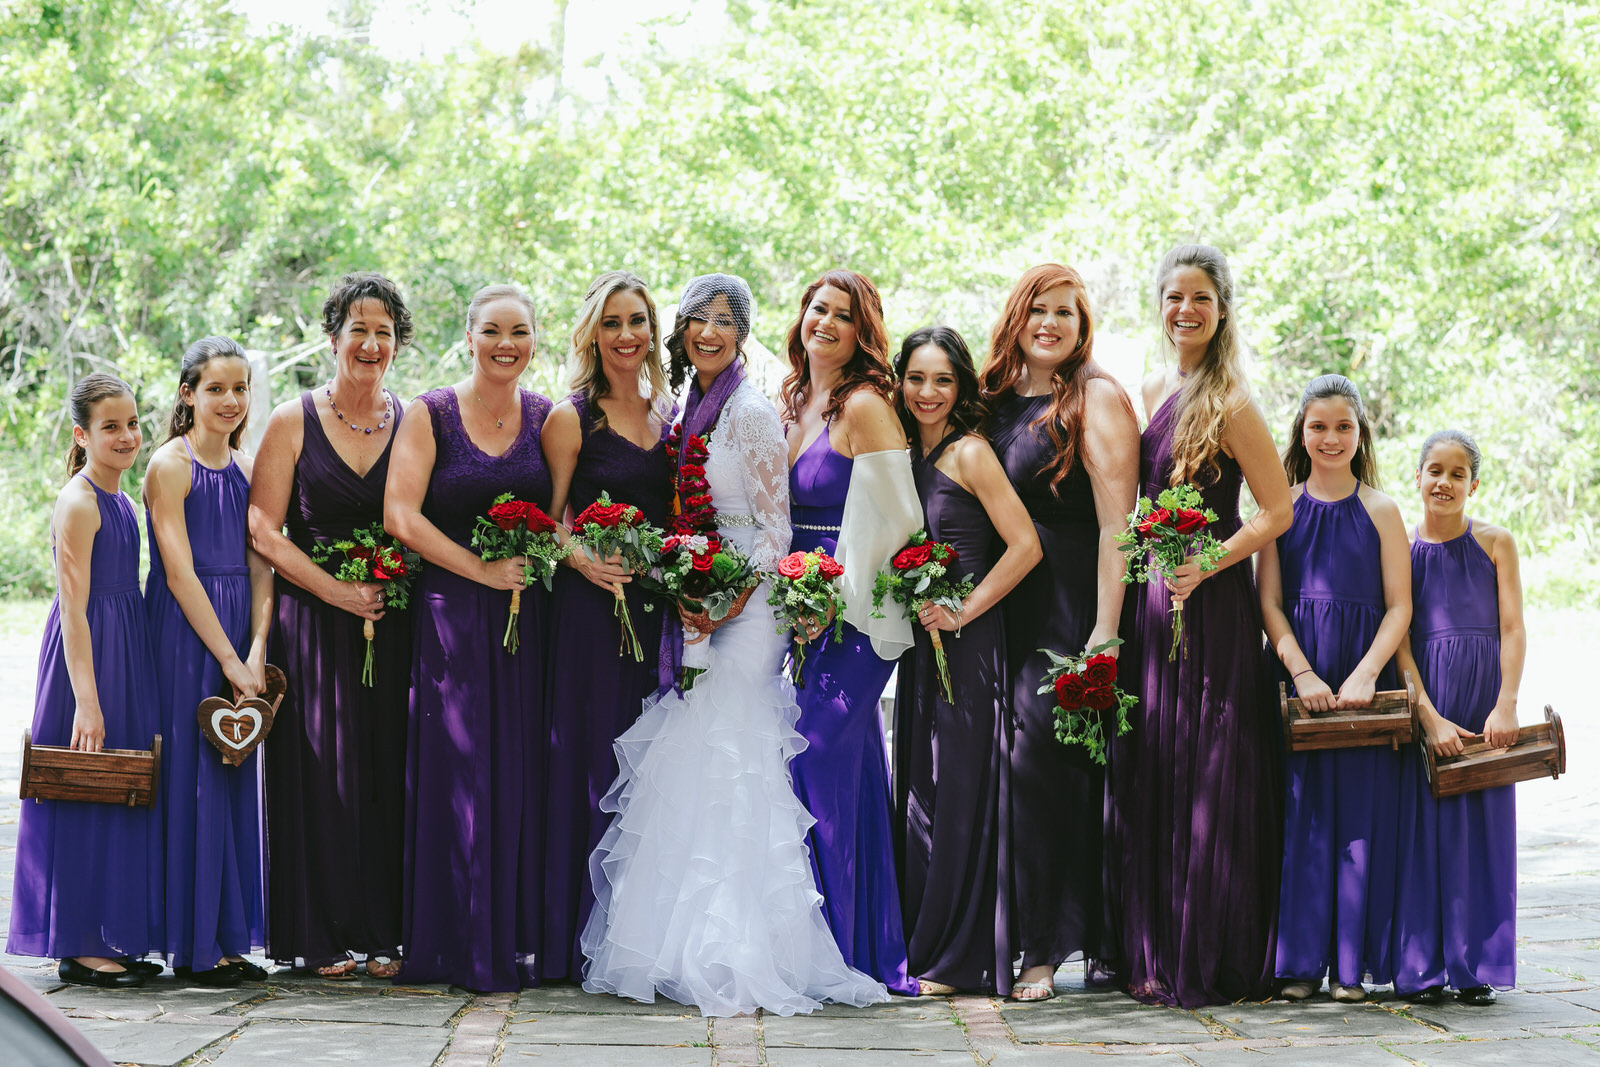 kashi-ashram-wedding-formal-portraits-wedding-party.jpg